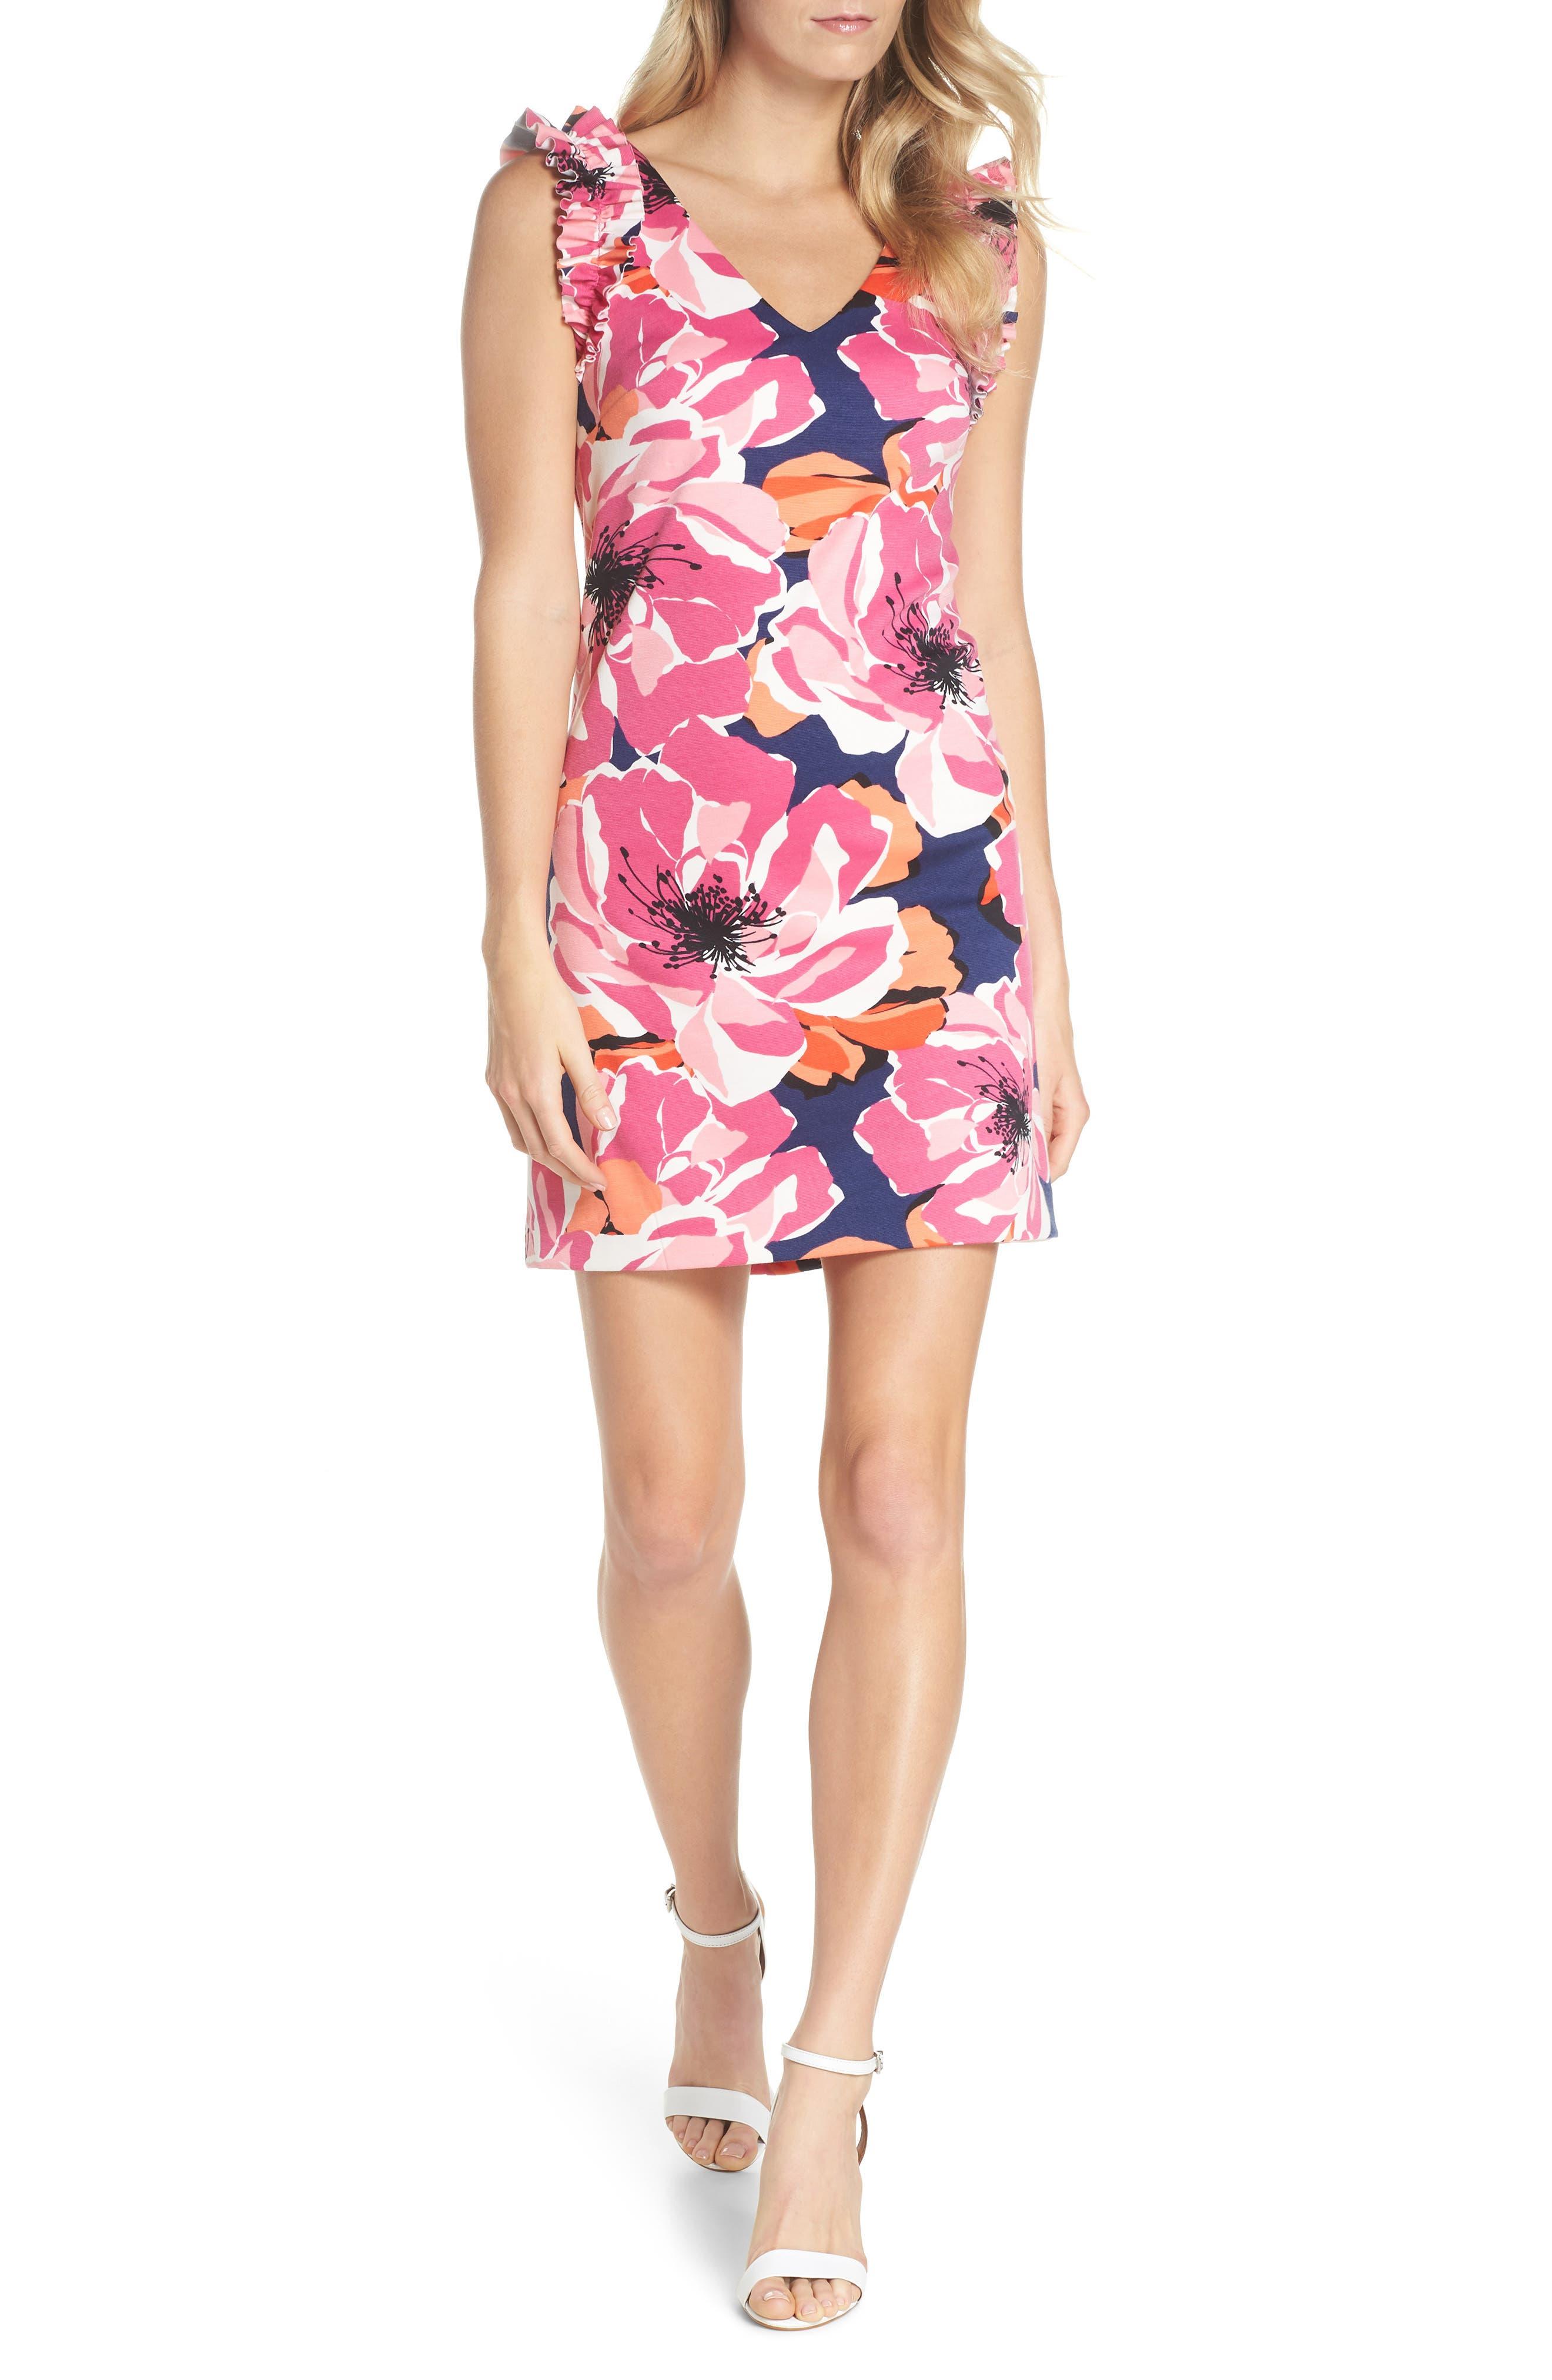 TRINA TRINA TURK Sirena Ruffle Sheath Dress, Main, color, 650